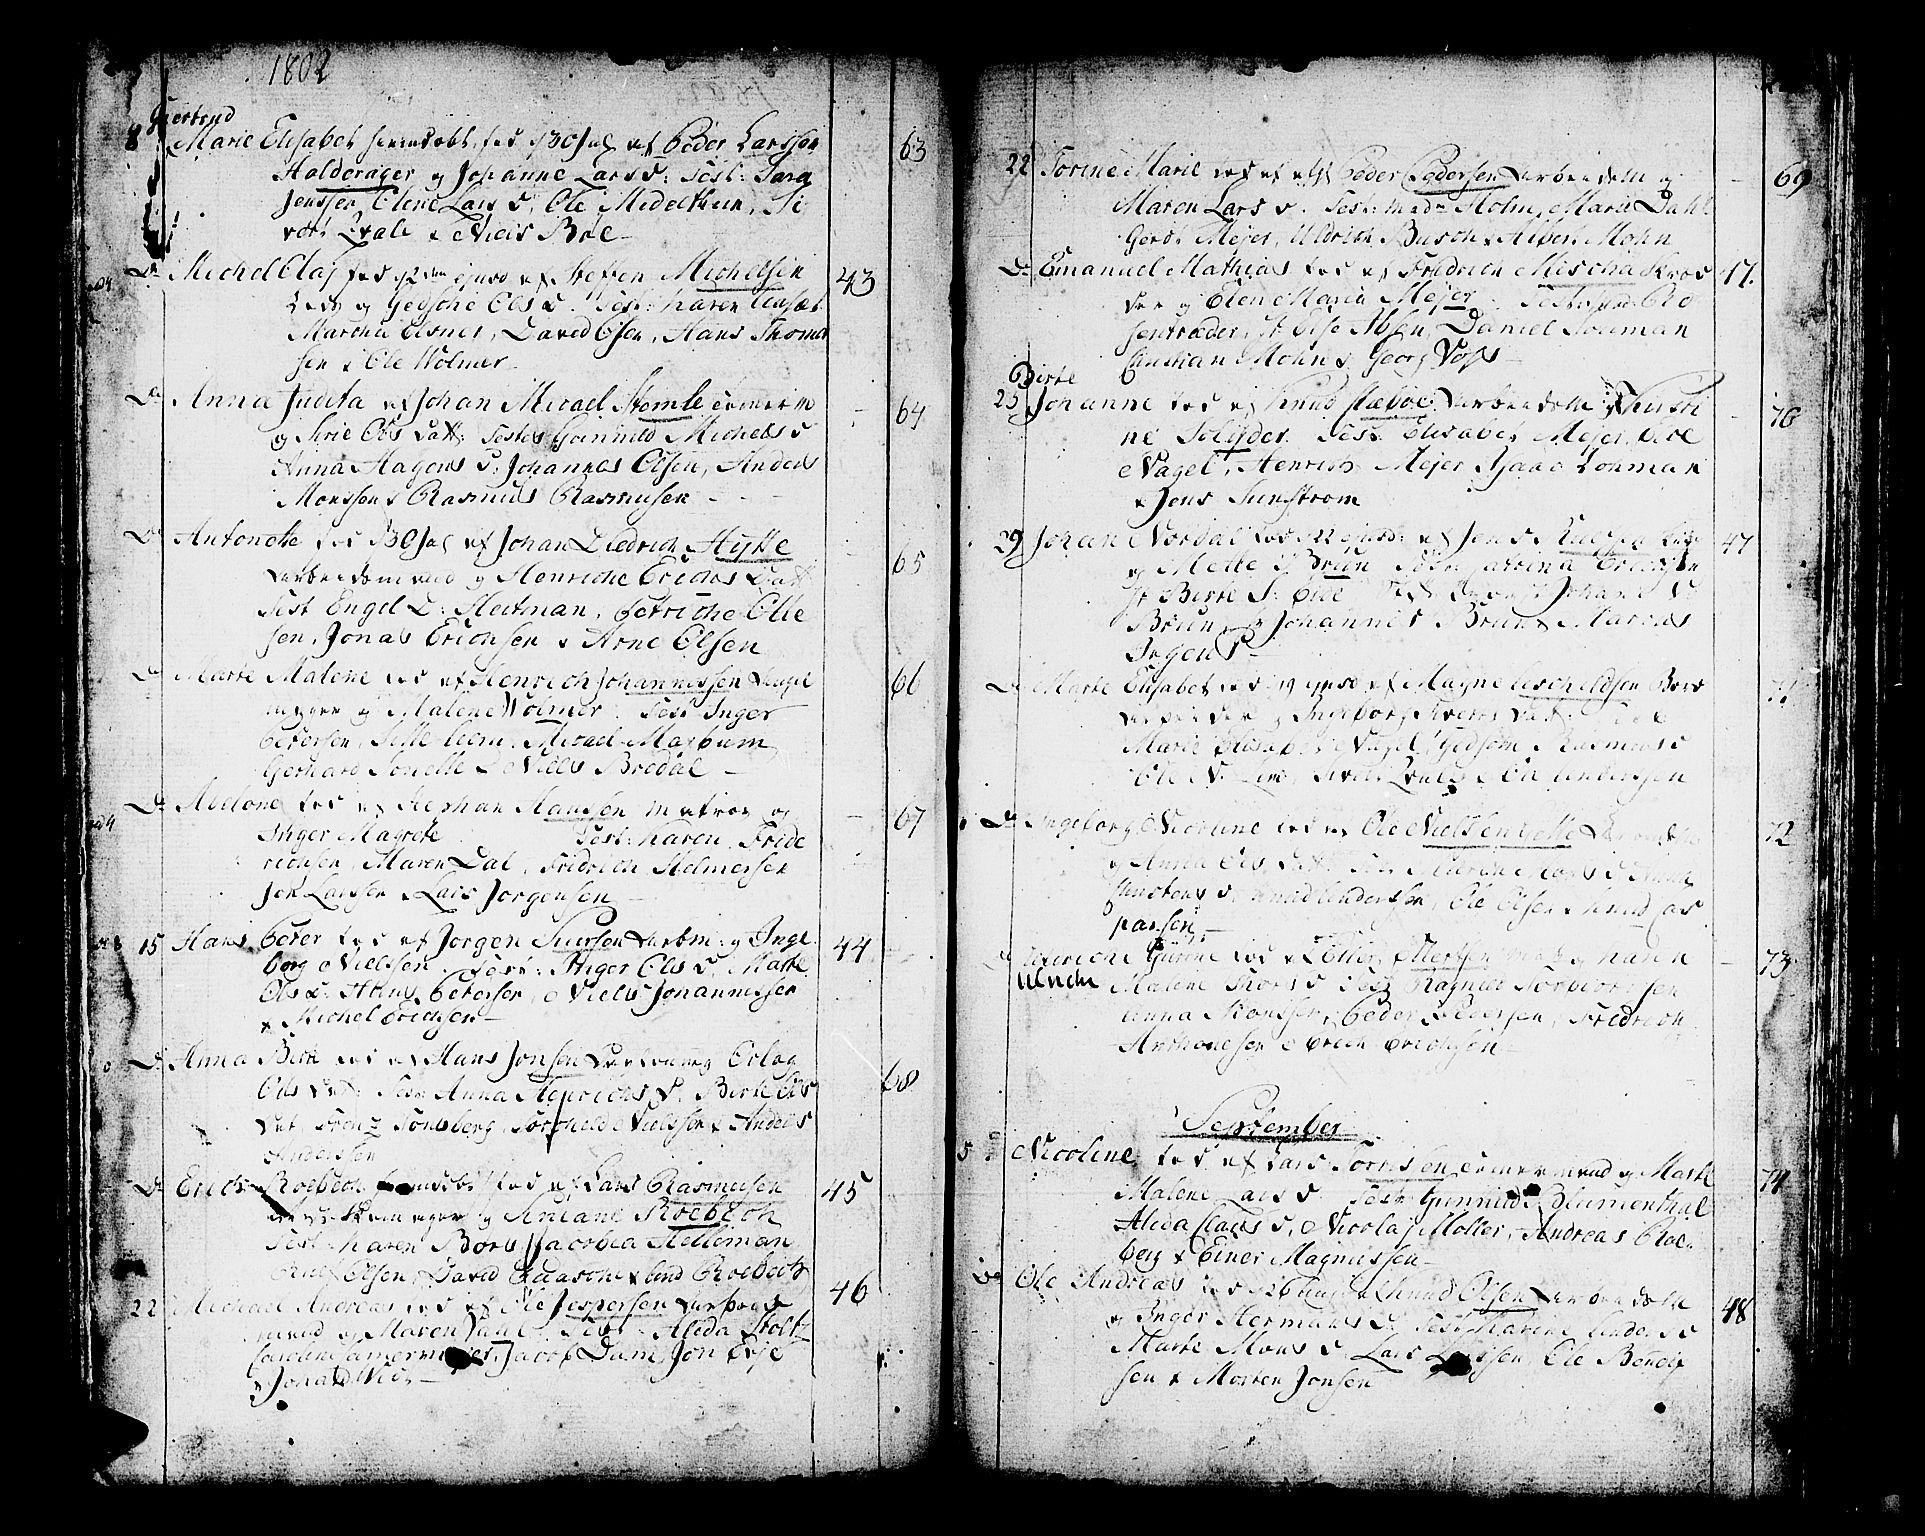 SAB, Domkirken sokneprestembete, H/Haa/L0004: Ministerialbok nr. A 4, 1763-1820, s. 280-281